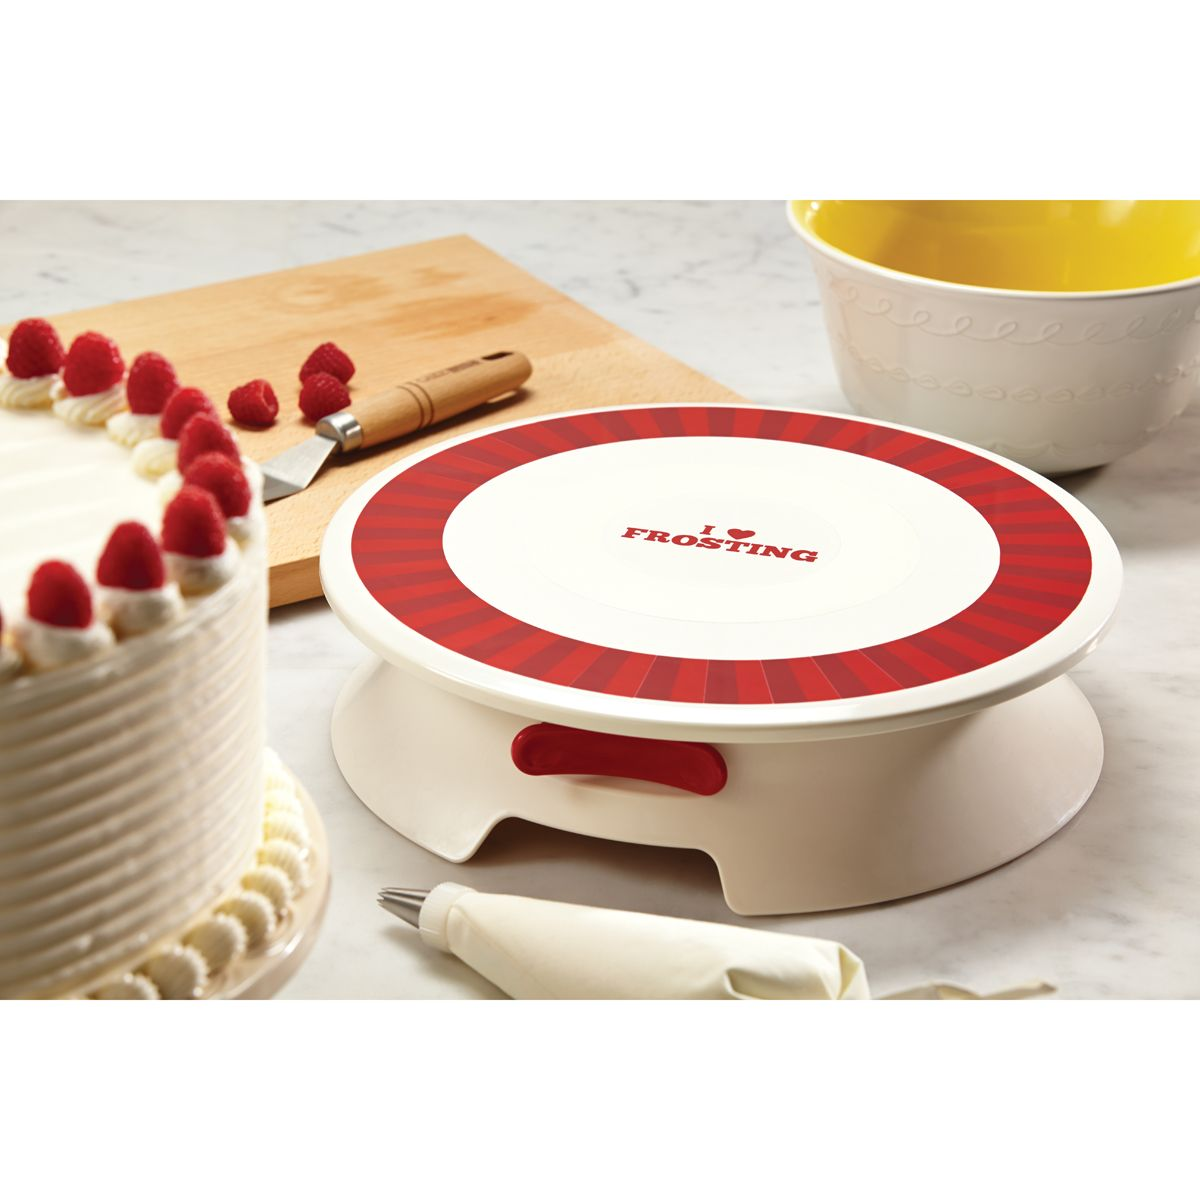 turntable cake stand kmart